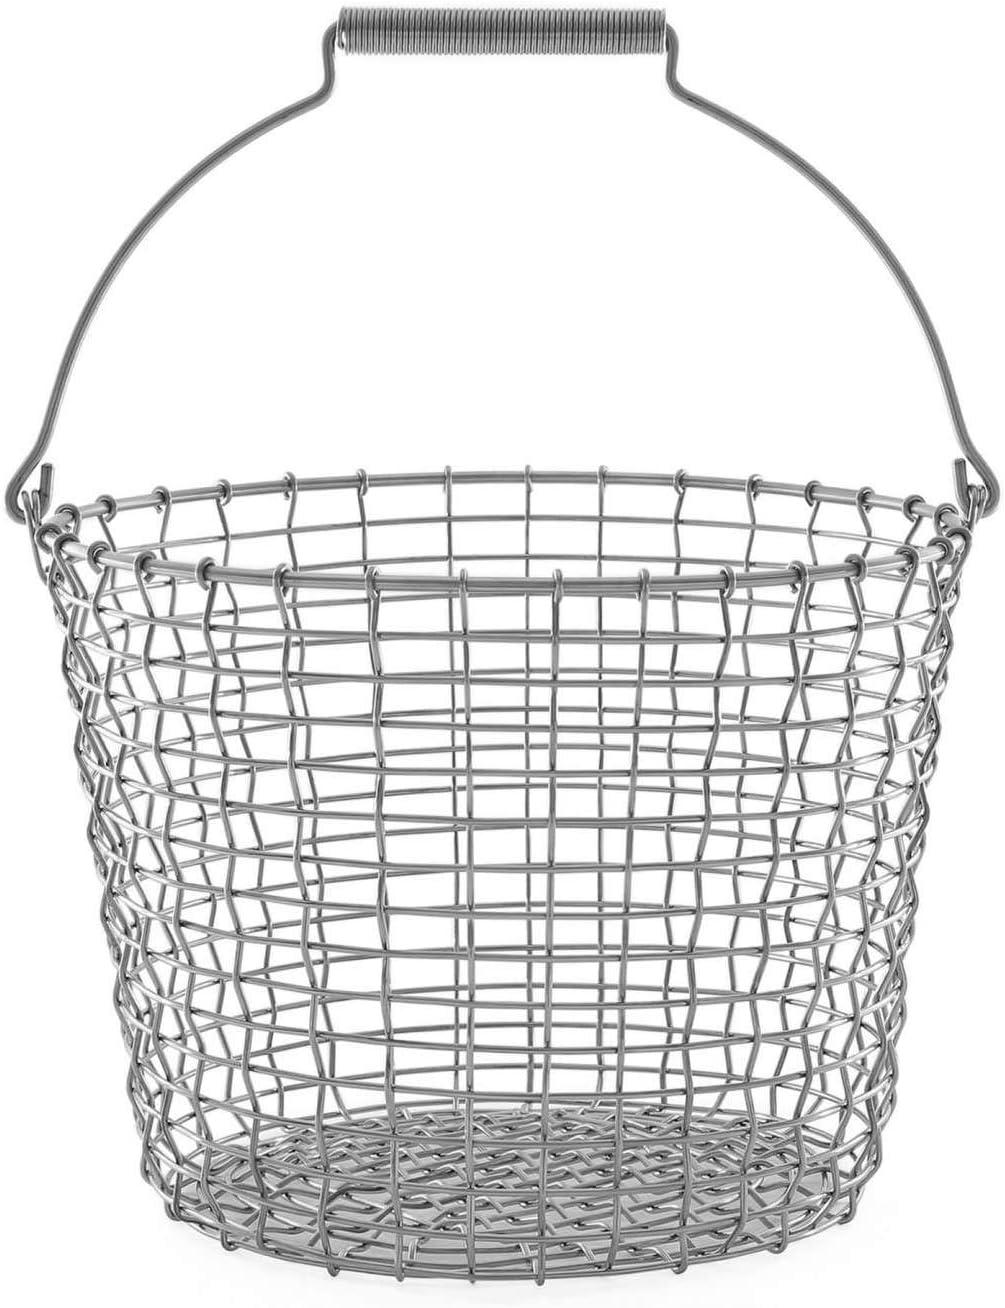 KORBO Bucket 24 Galvanized 380x380x280 mm